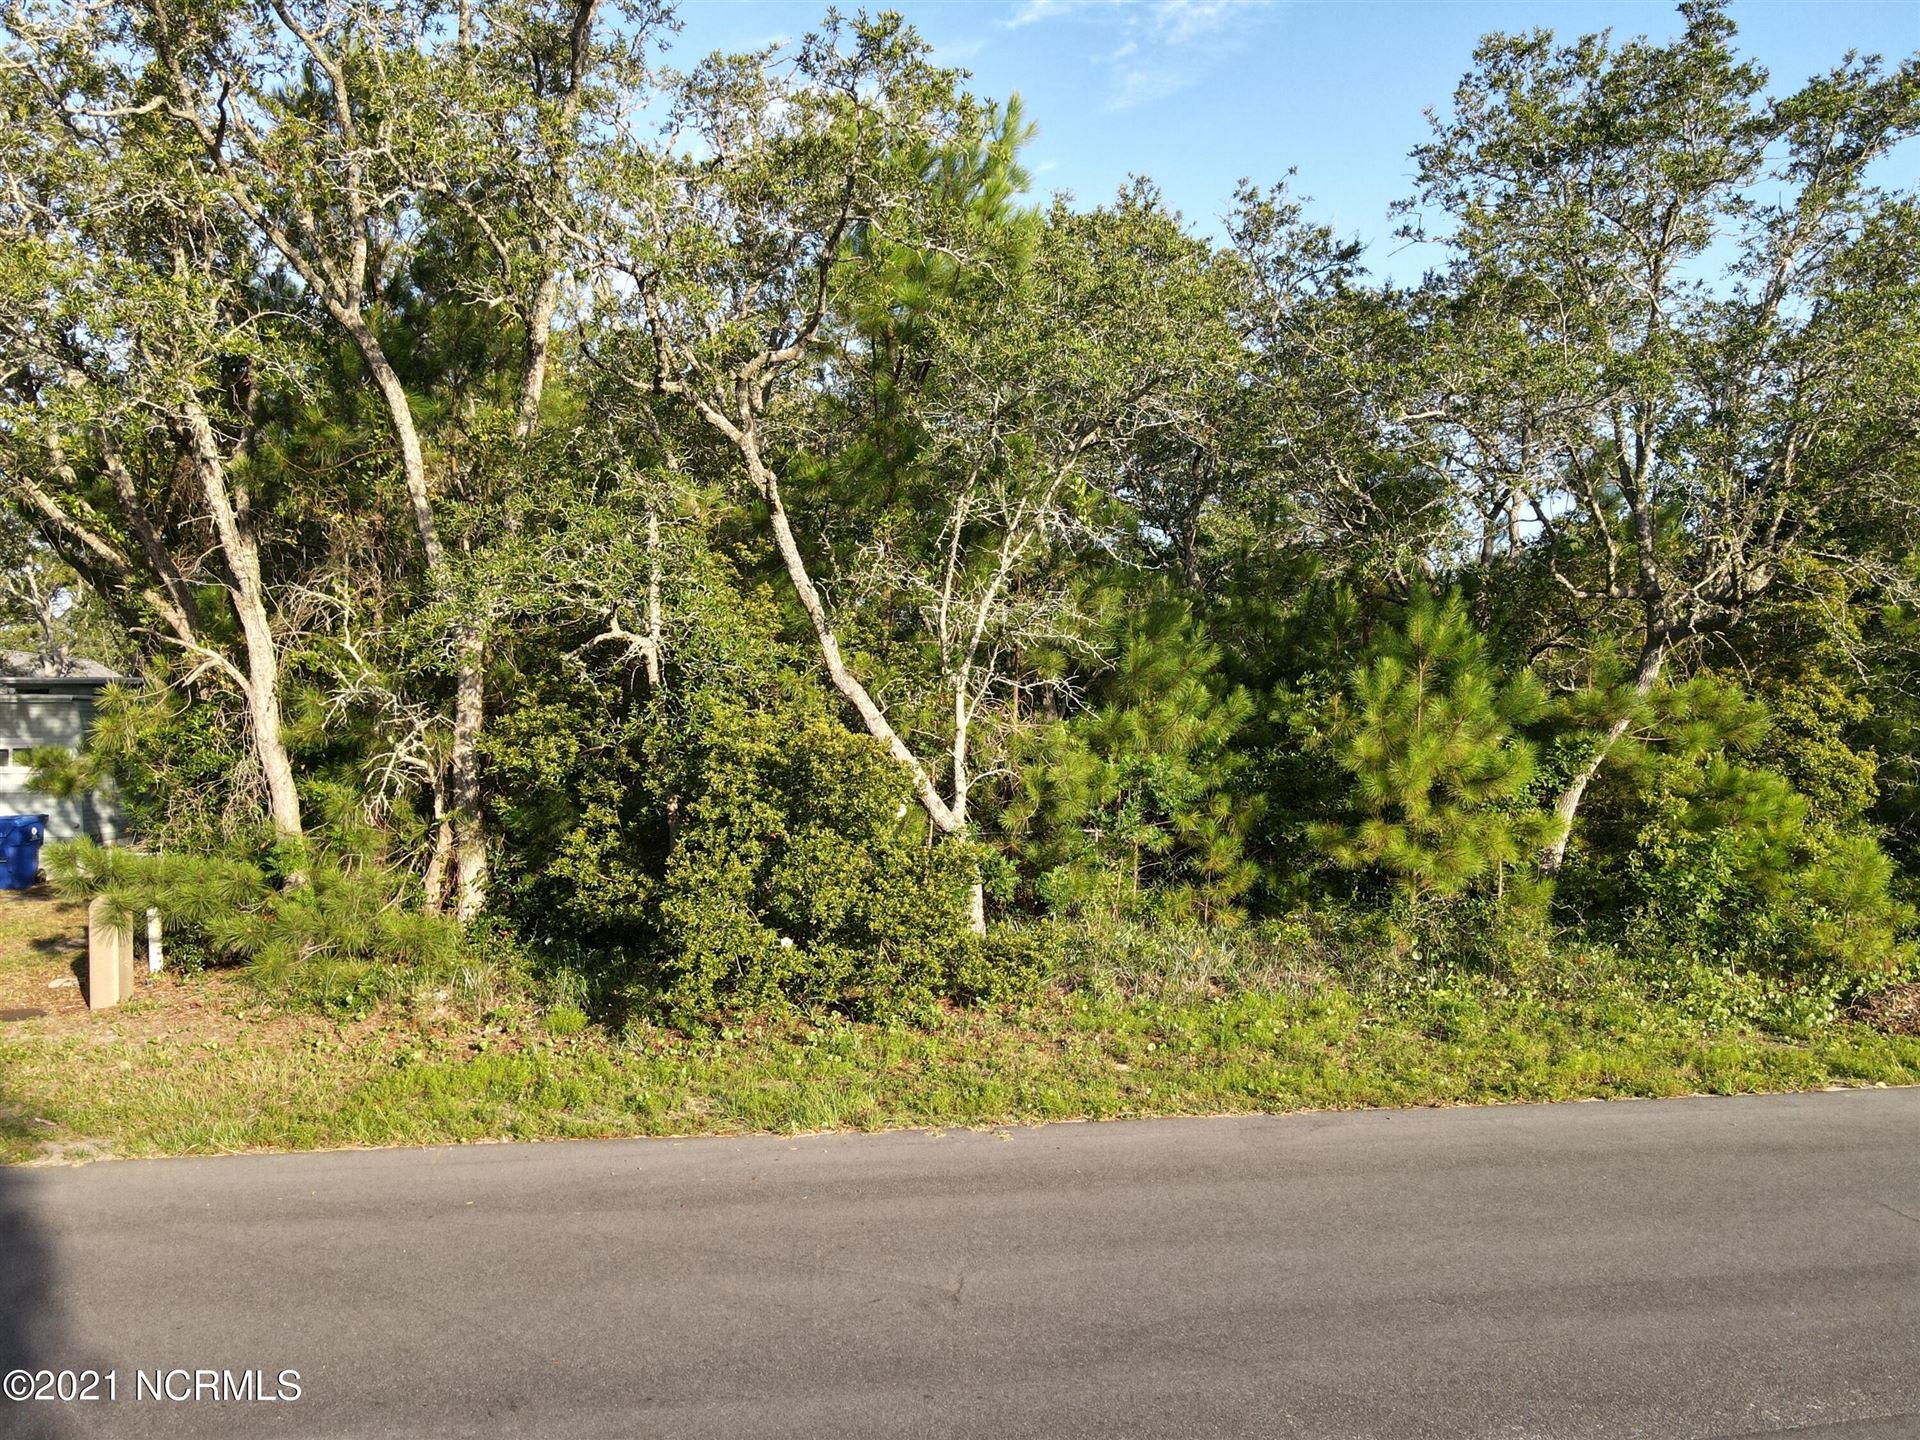 Photo for 135 NE 73rd Street, Oak Island, NC 28465 (MLS # 100282752)